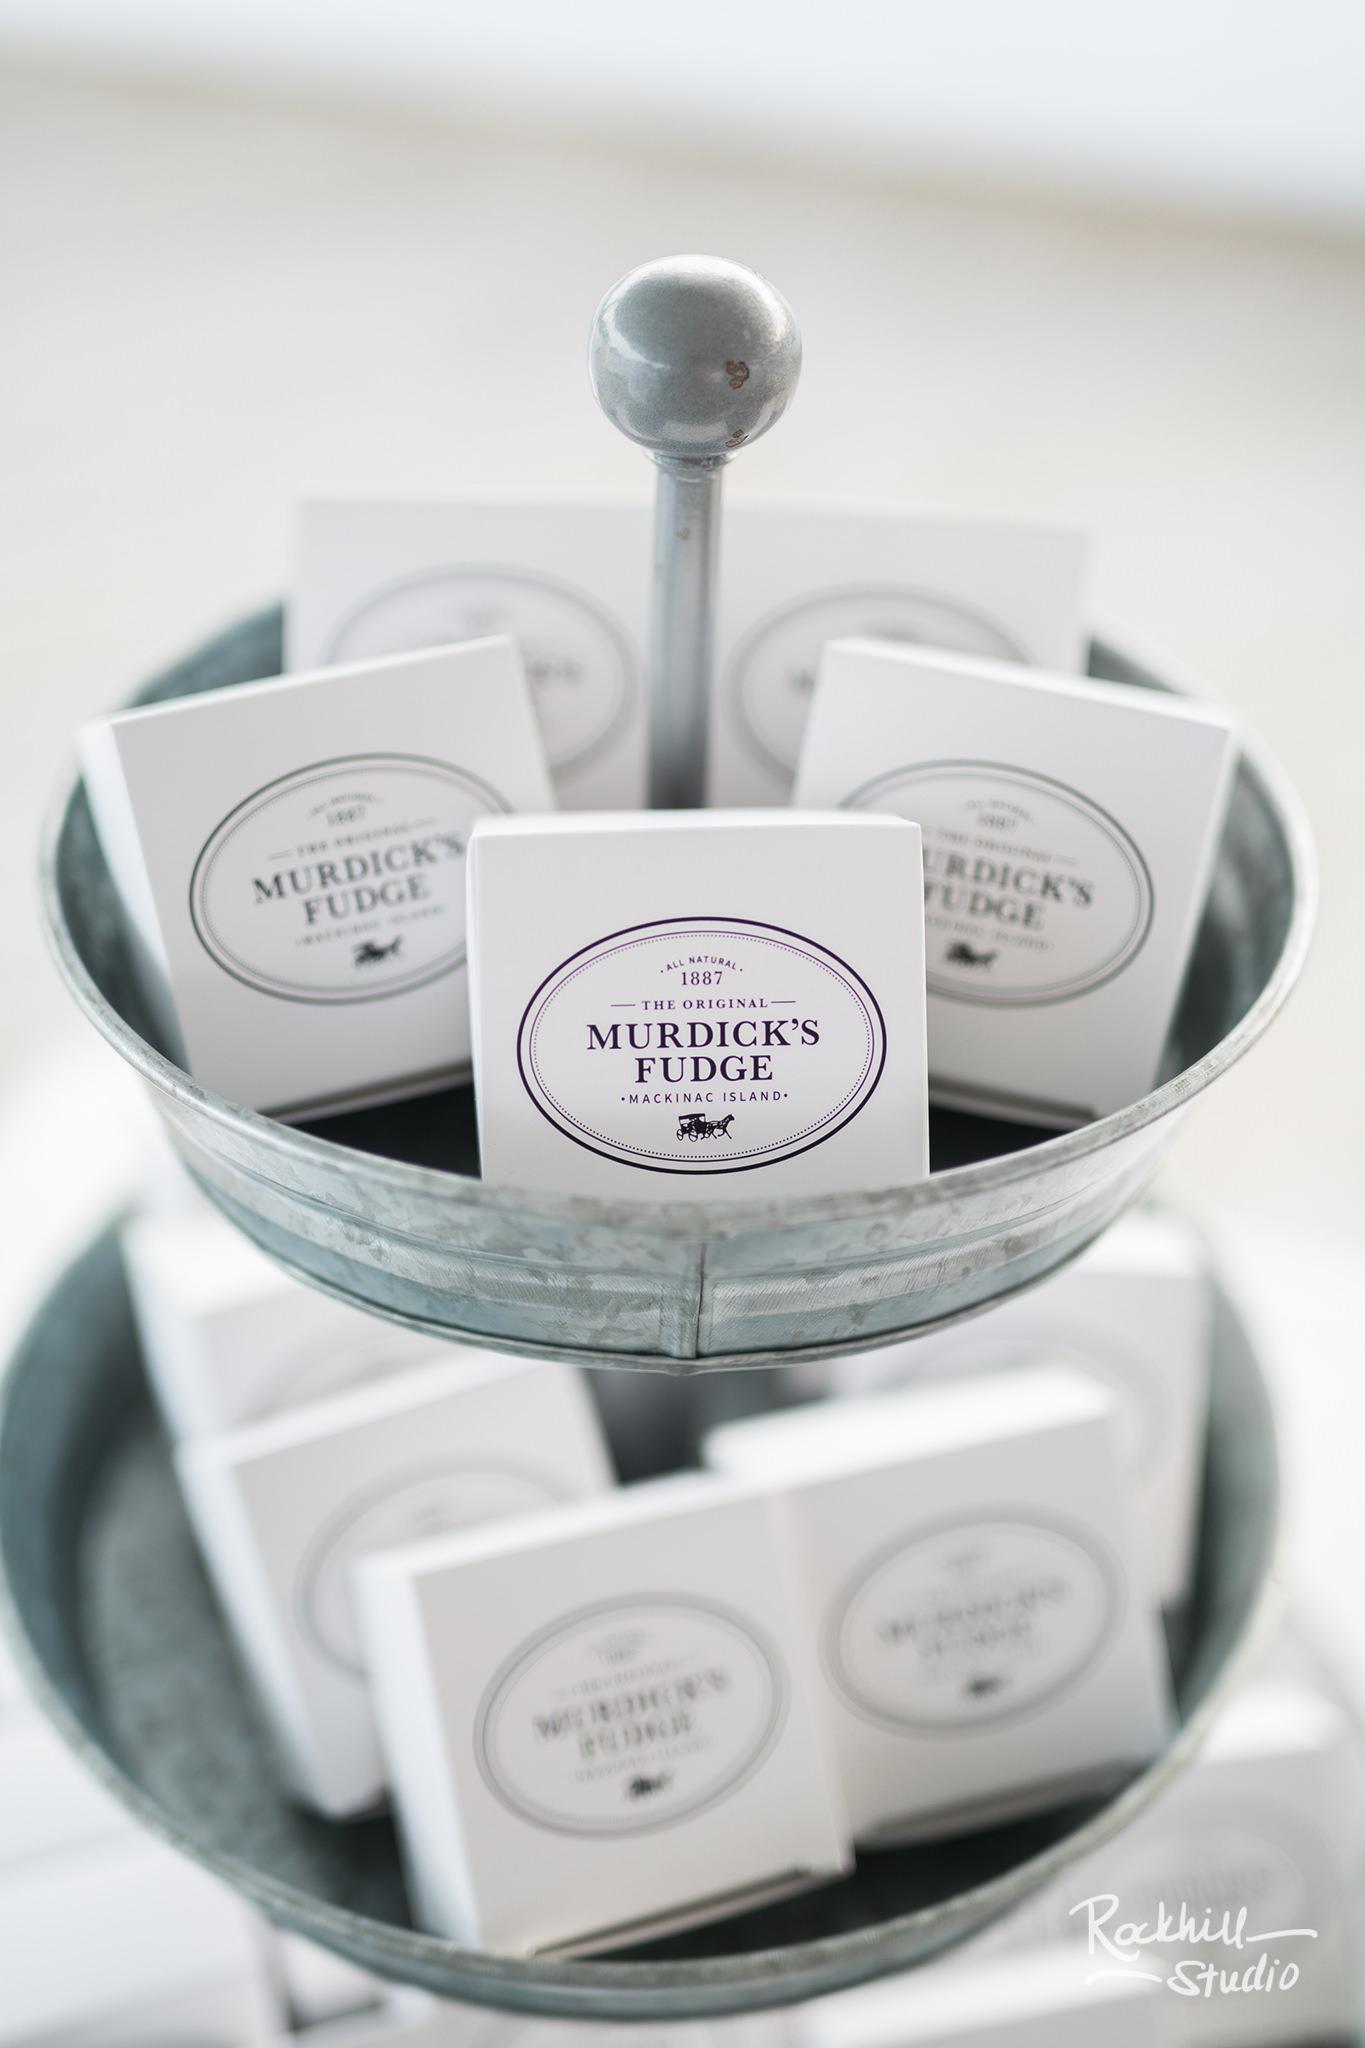 Mission Point Wedding, Murdick's fudge, Traverse City Wedding Photographer Rockhill Studio